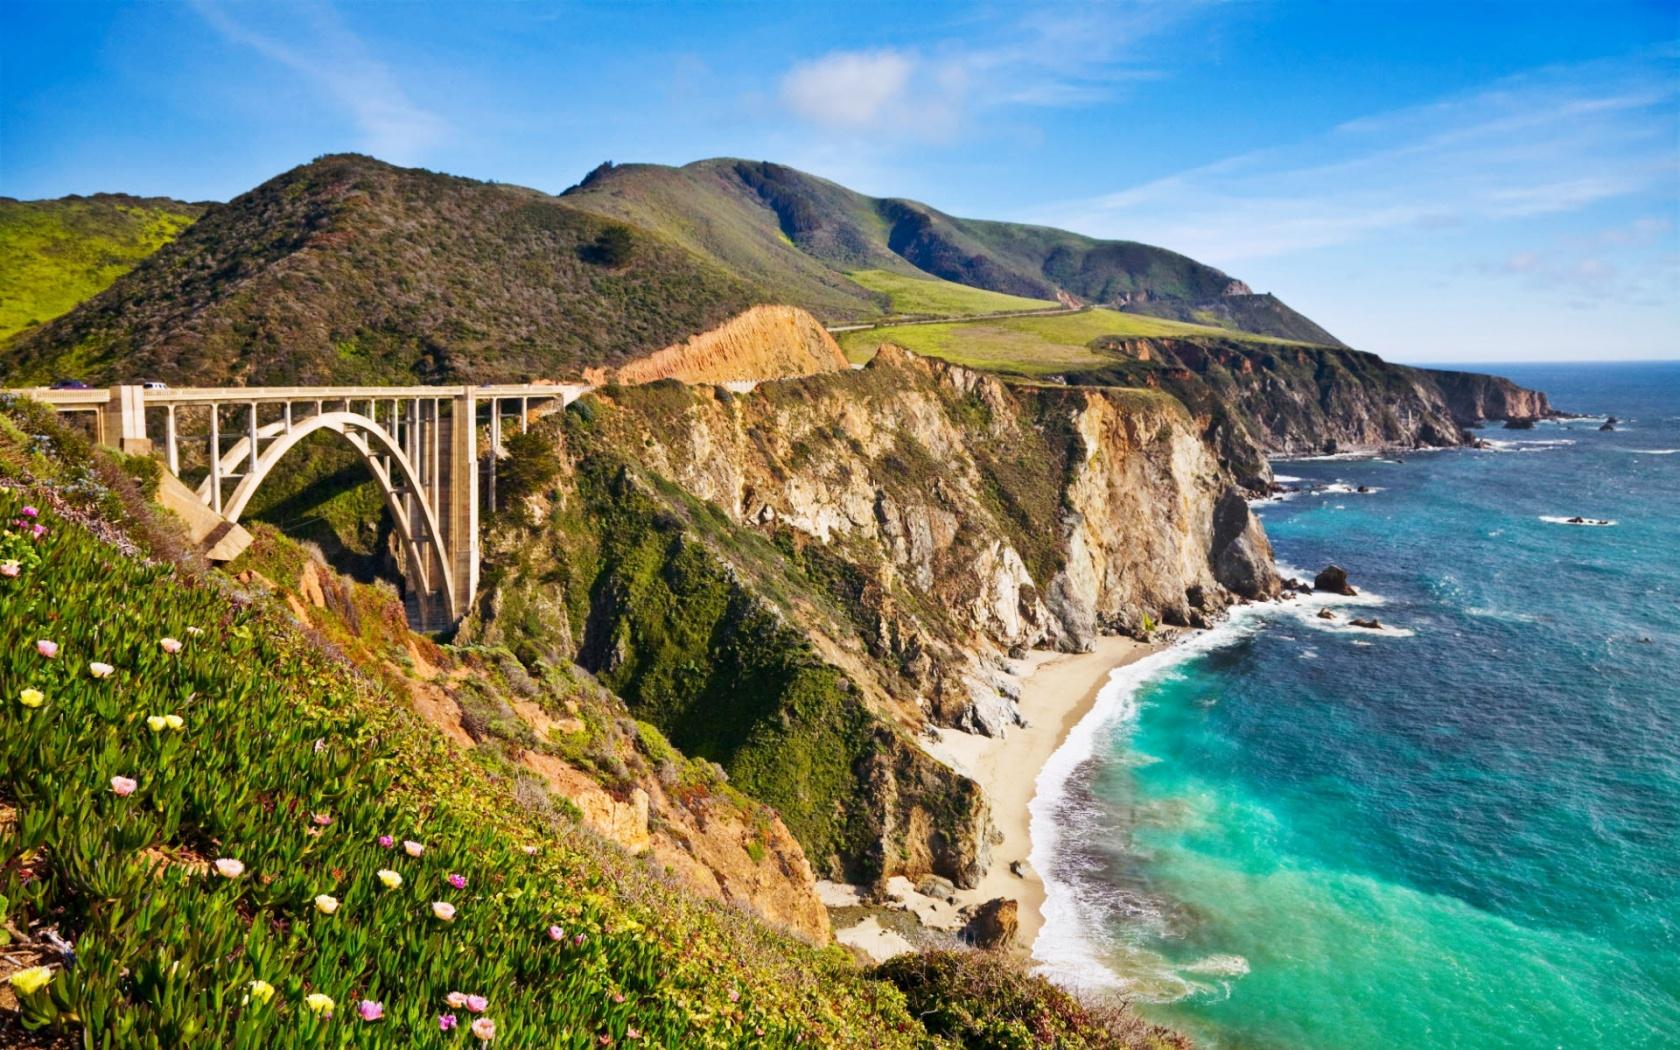 4182794-bixby-bridge-in-big-sur-california.jpg